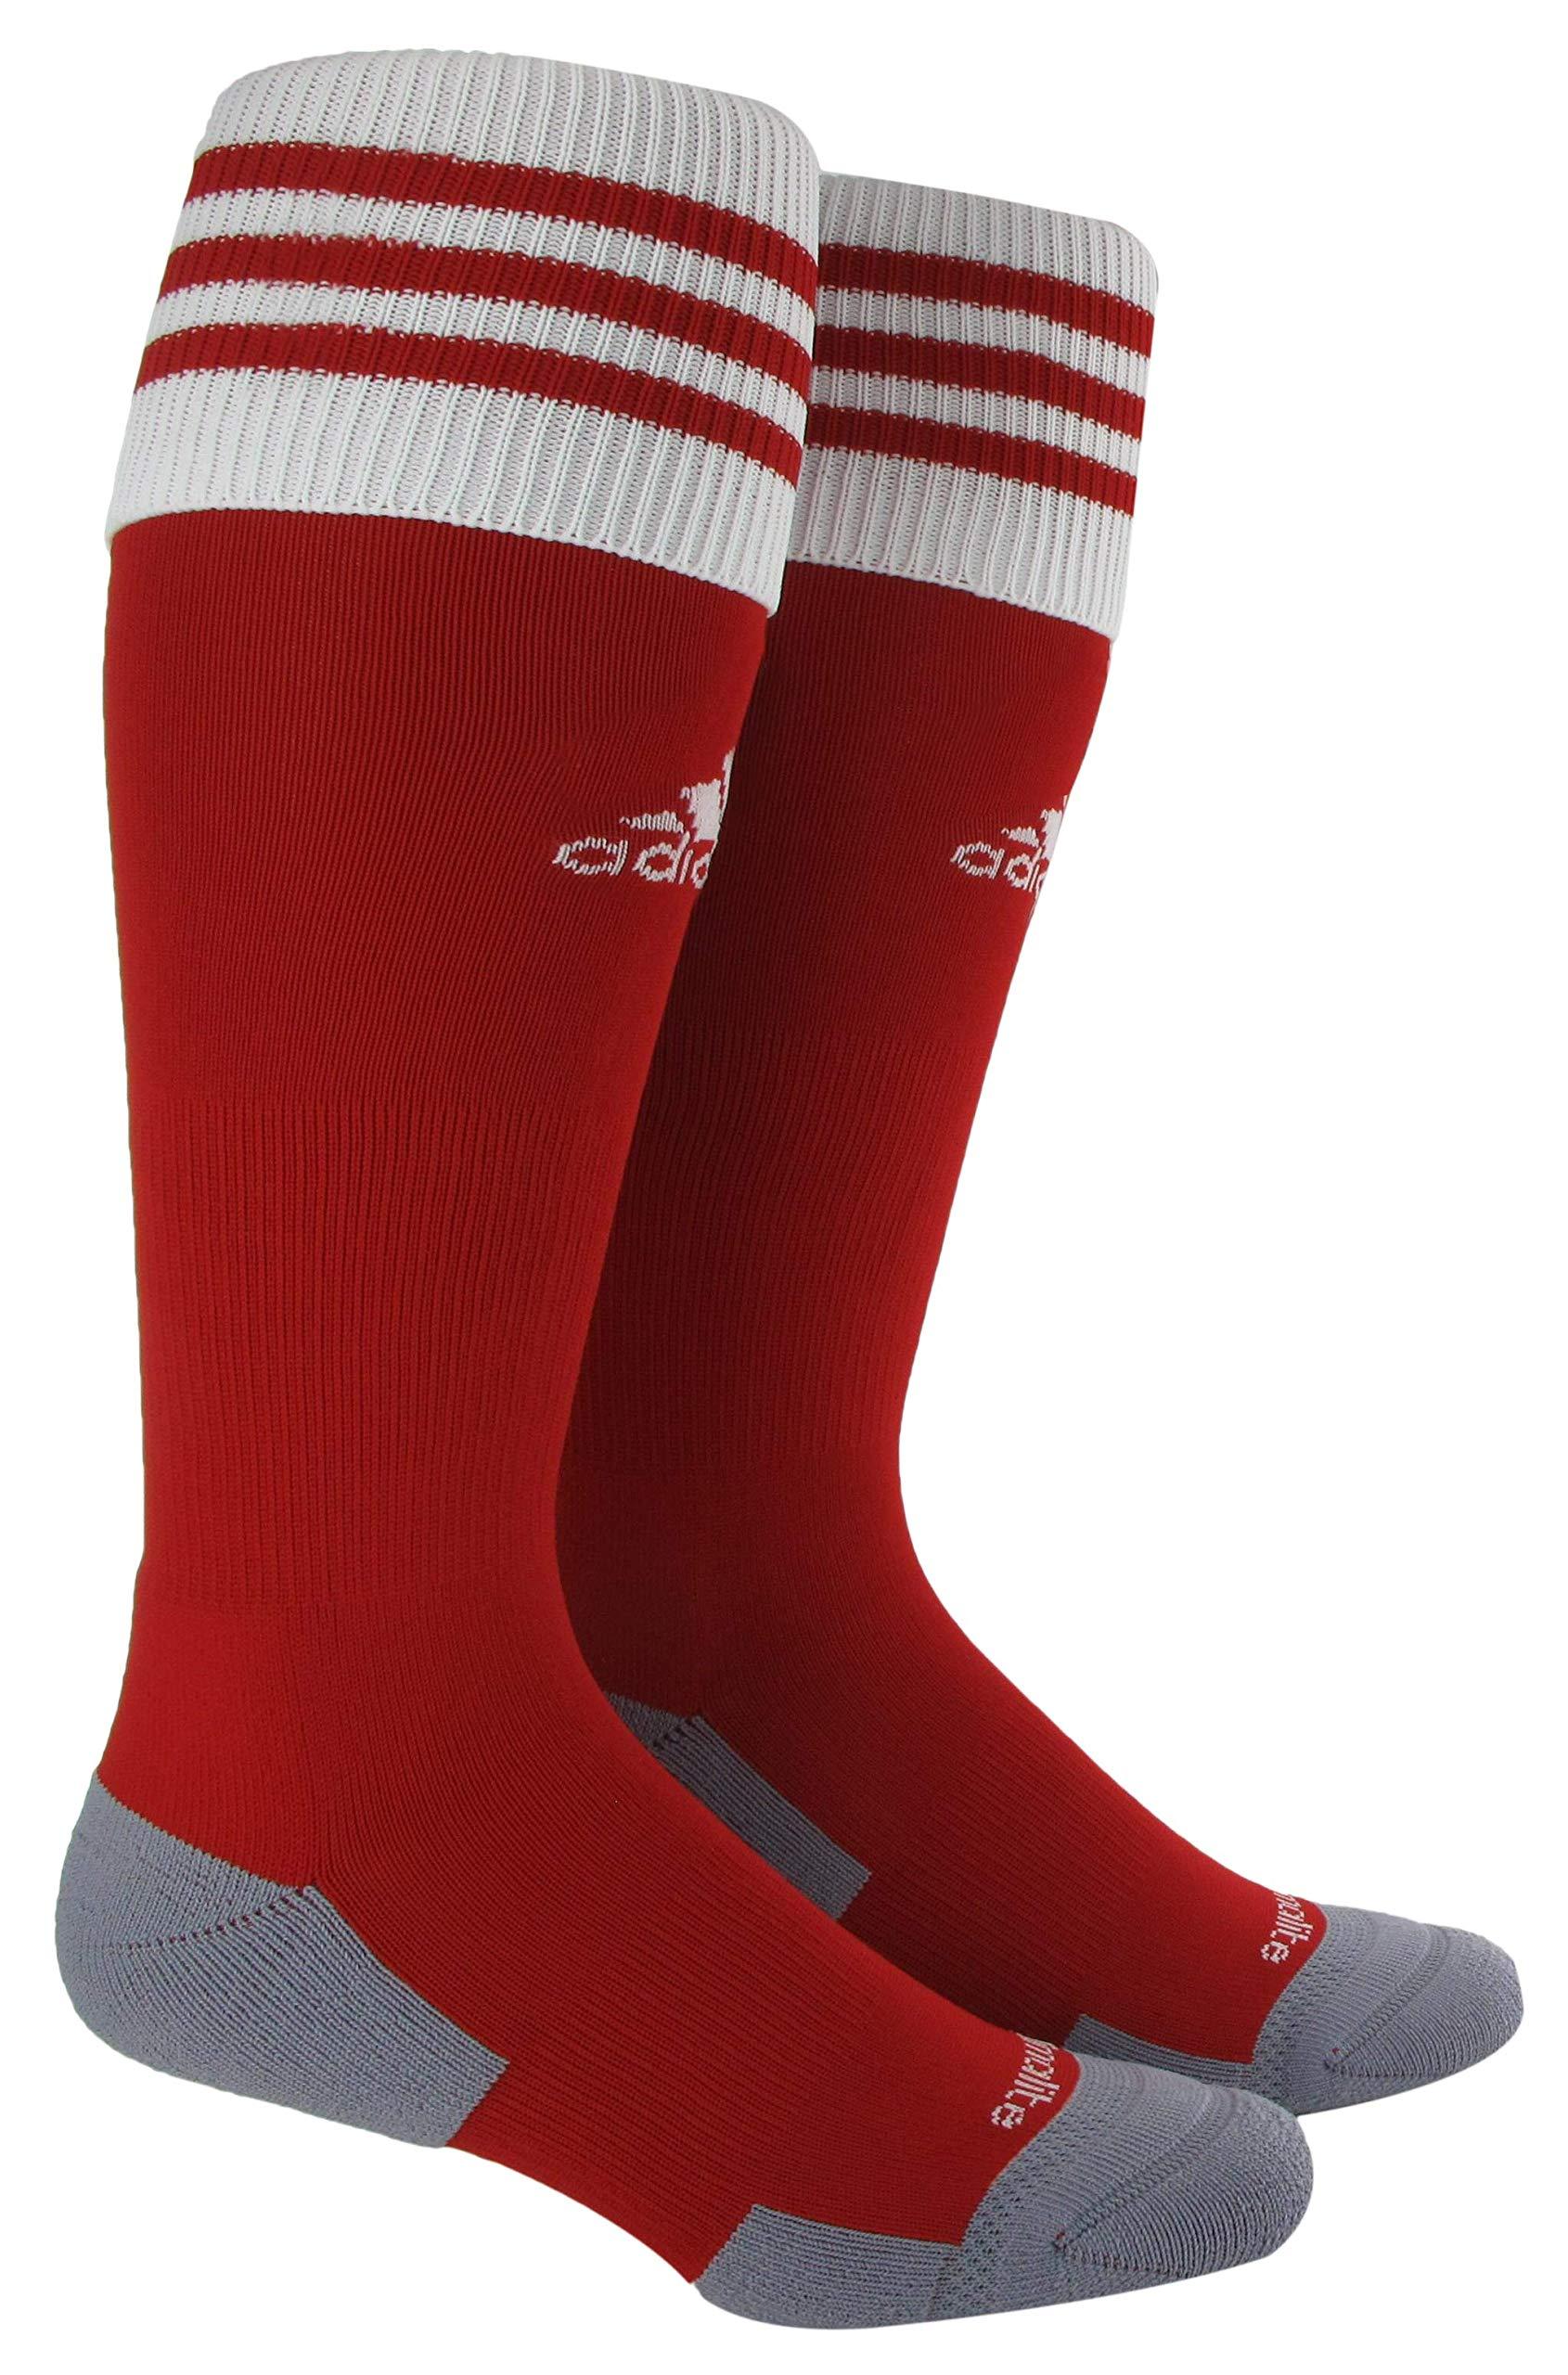 adidas Unisex Copa Zone Cushion II Soccer Sock (1-Pair), University Red/White, 9-13 by adidas